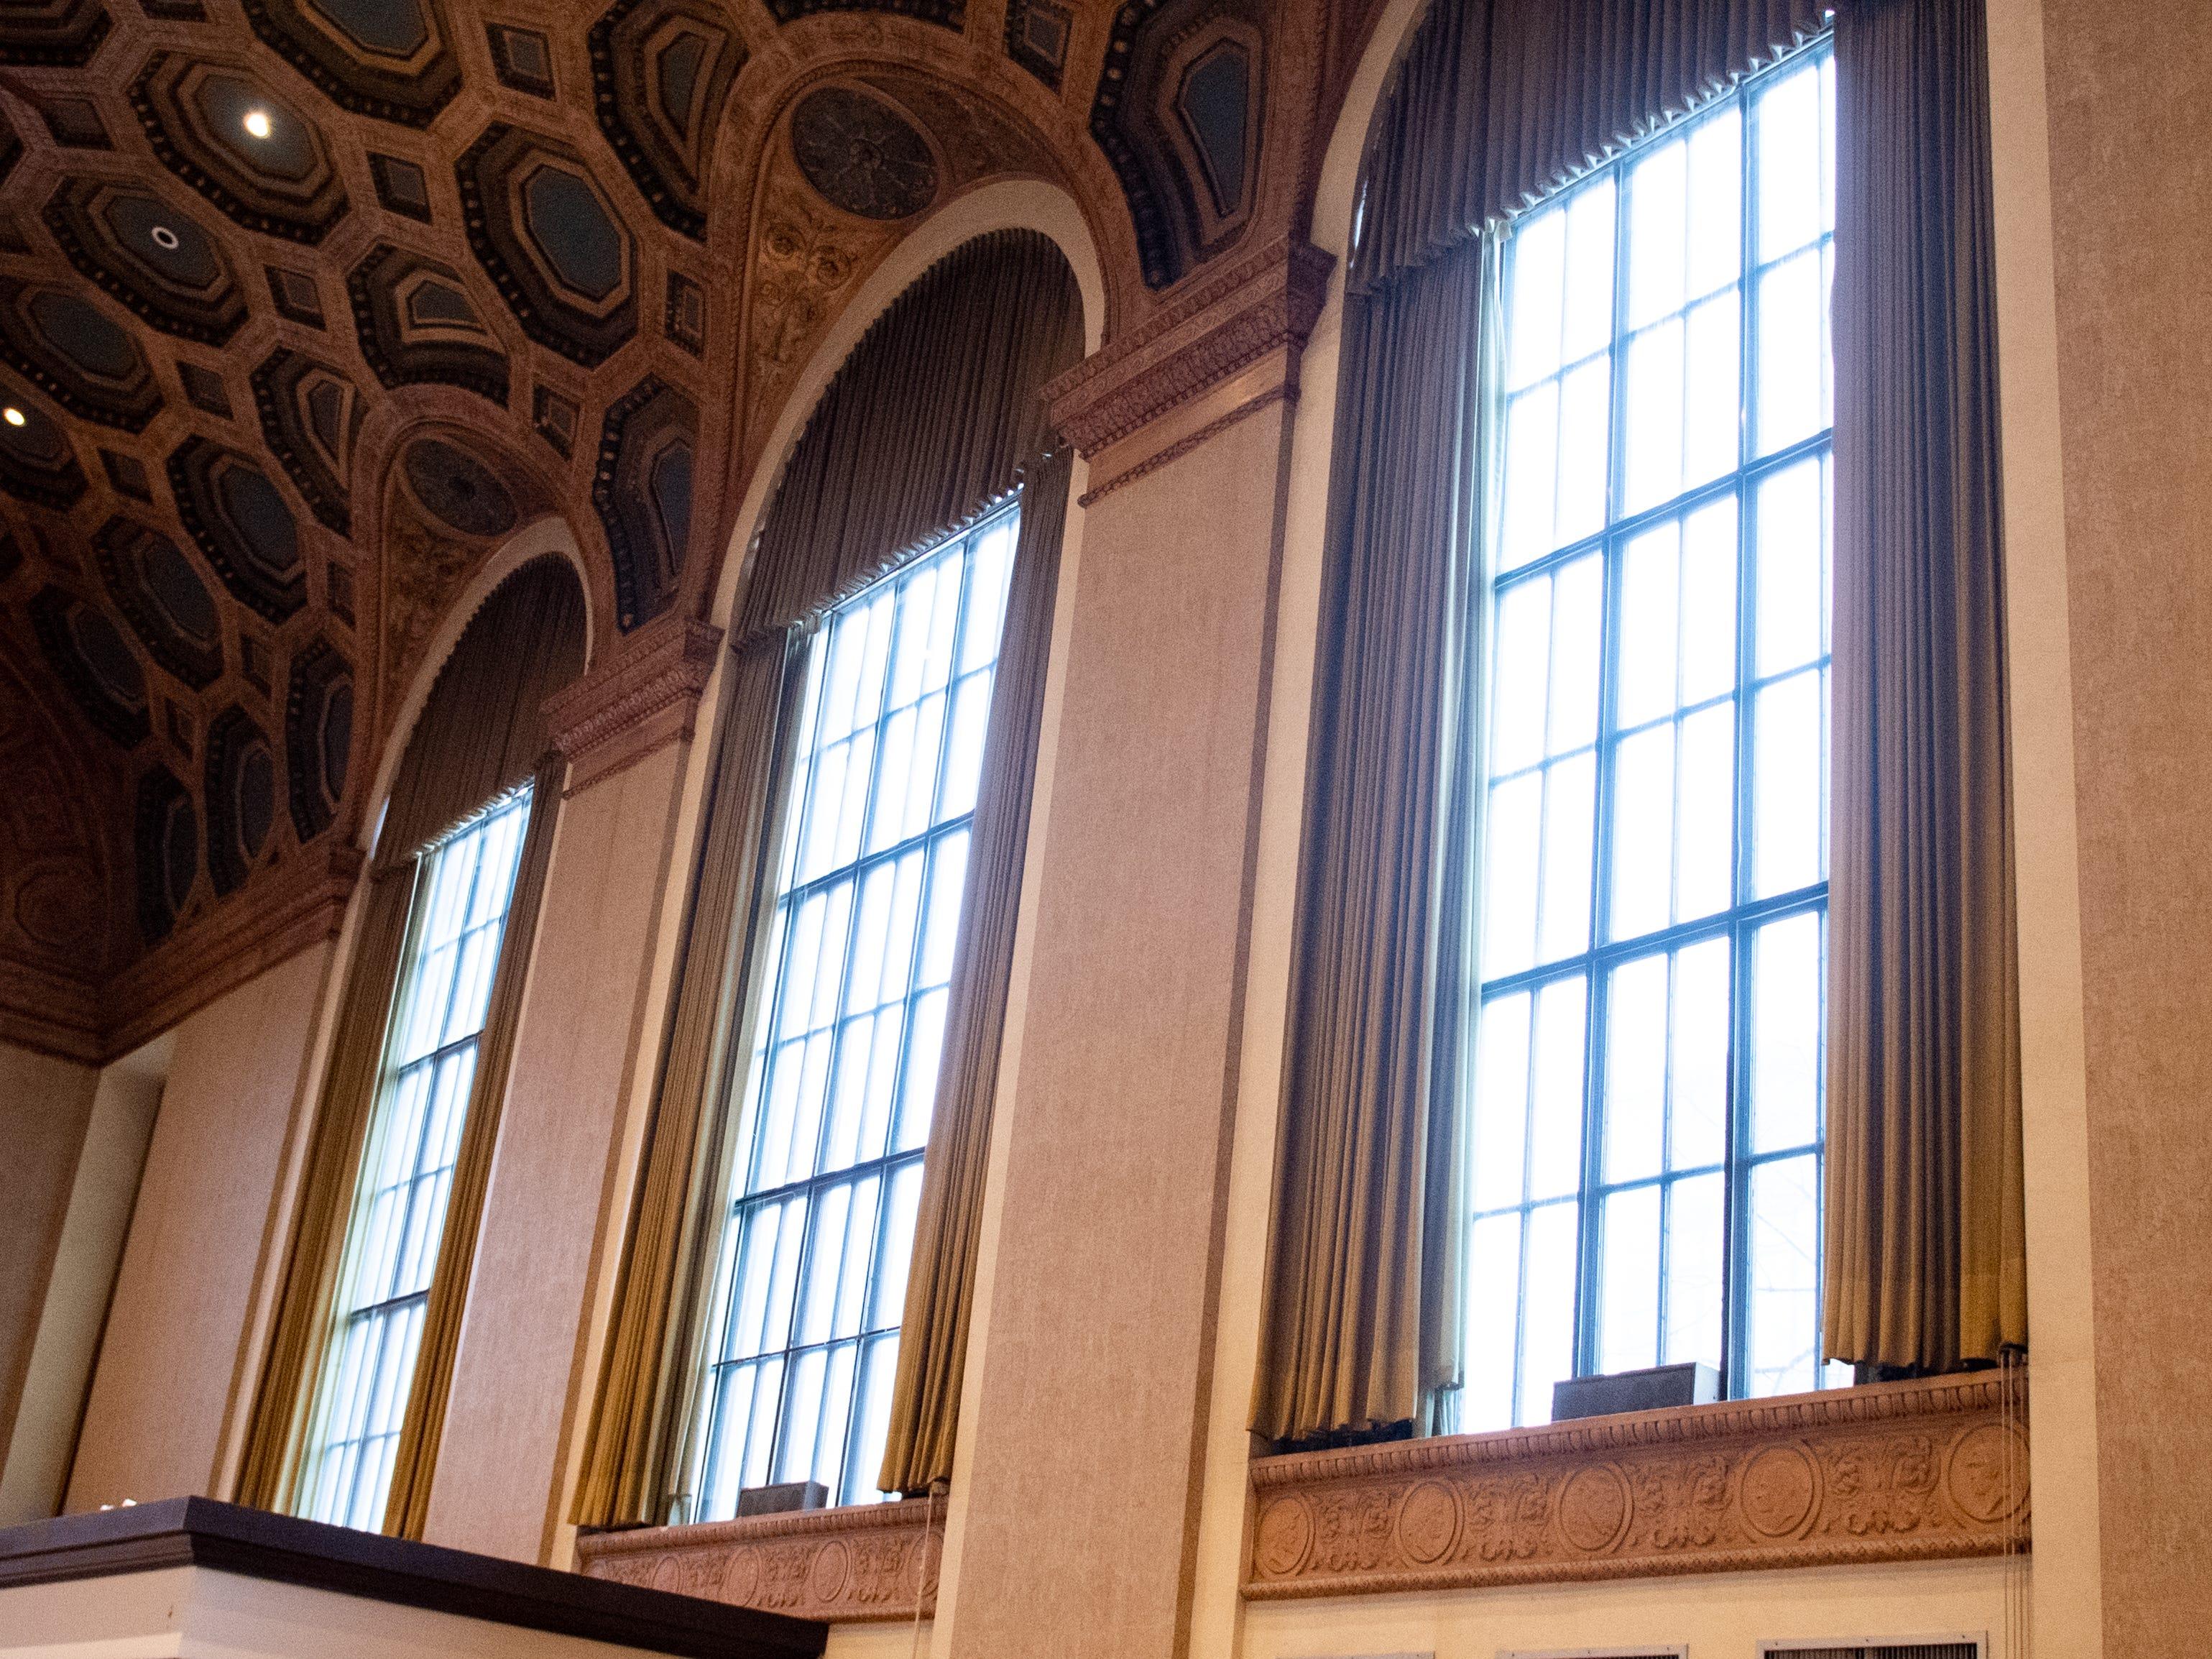 The windows will be repainted in the refurbishing effort, January 29, 2019.